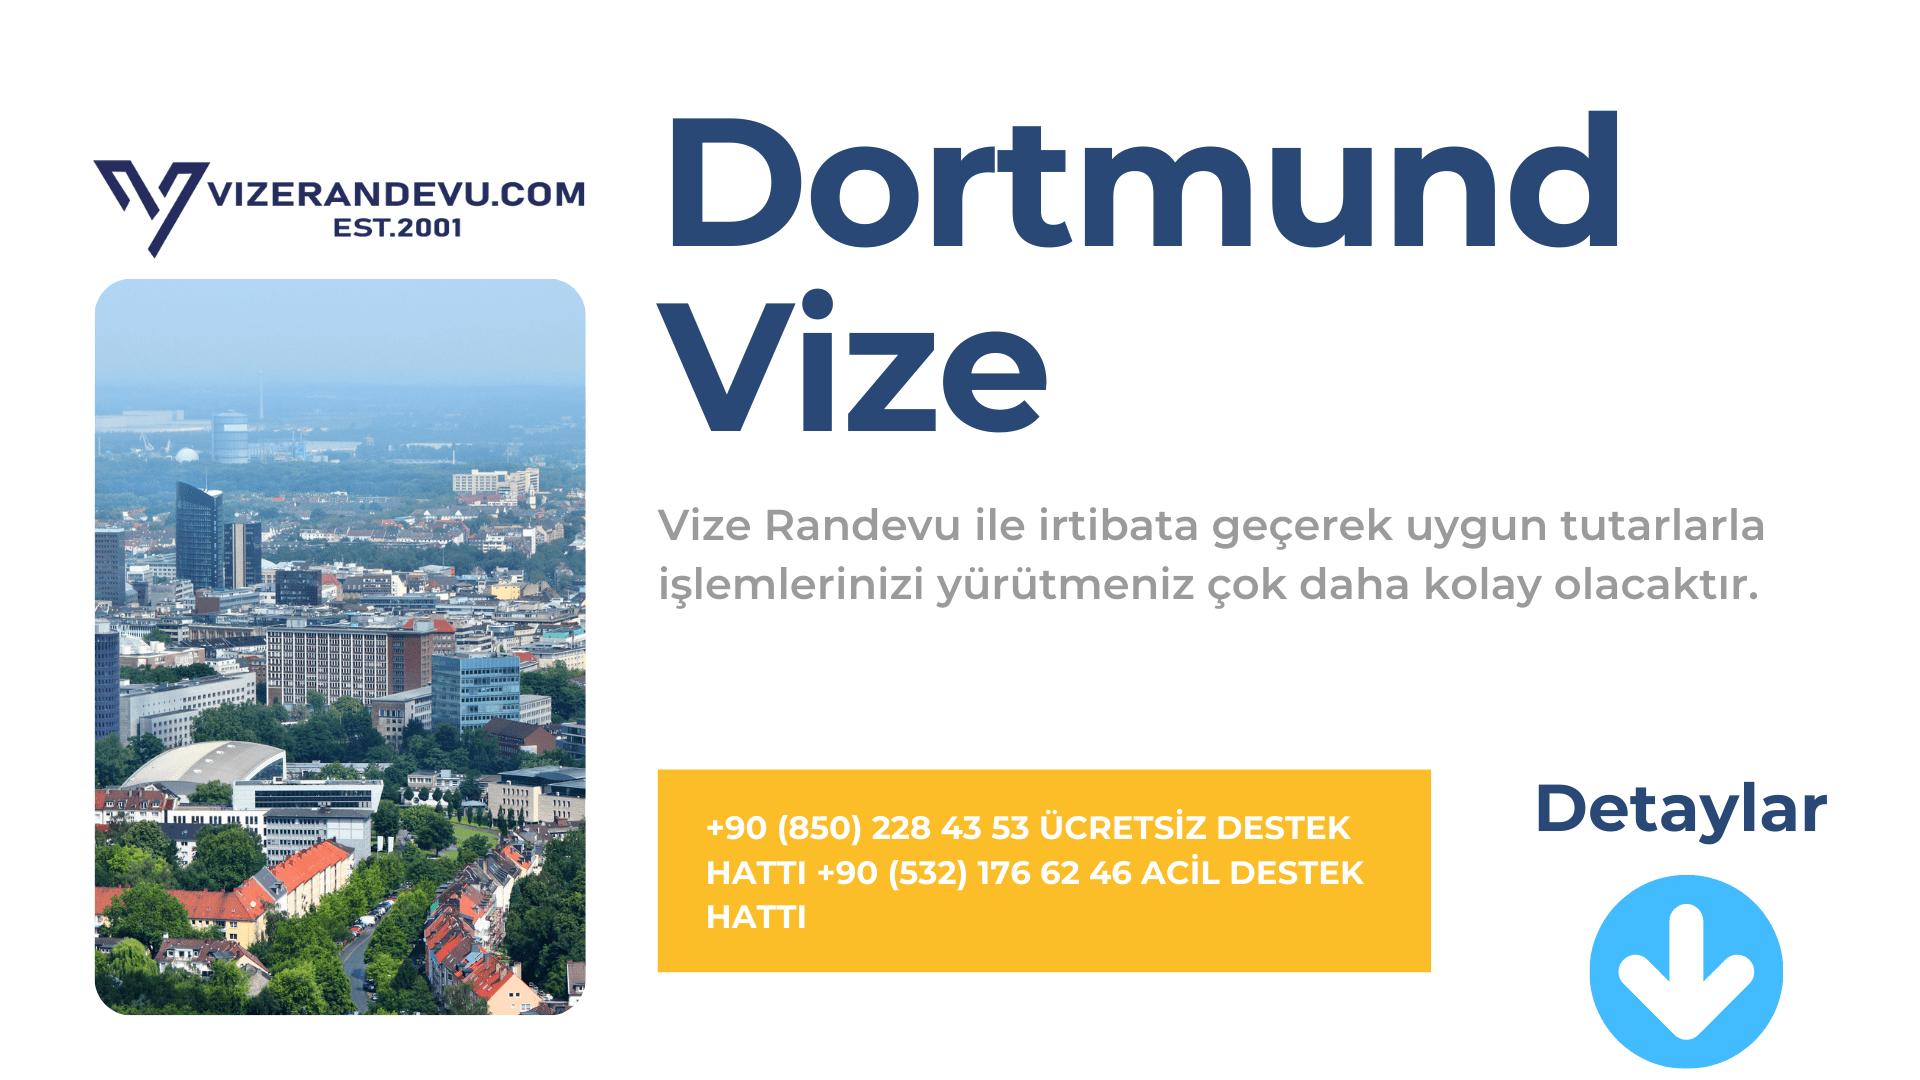 Almanya Dortmund Vize Başvurusu